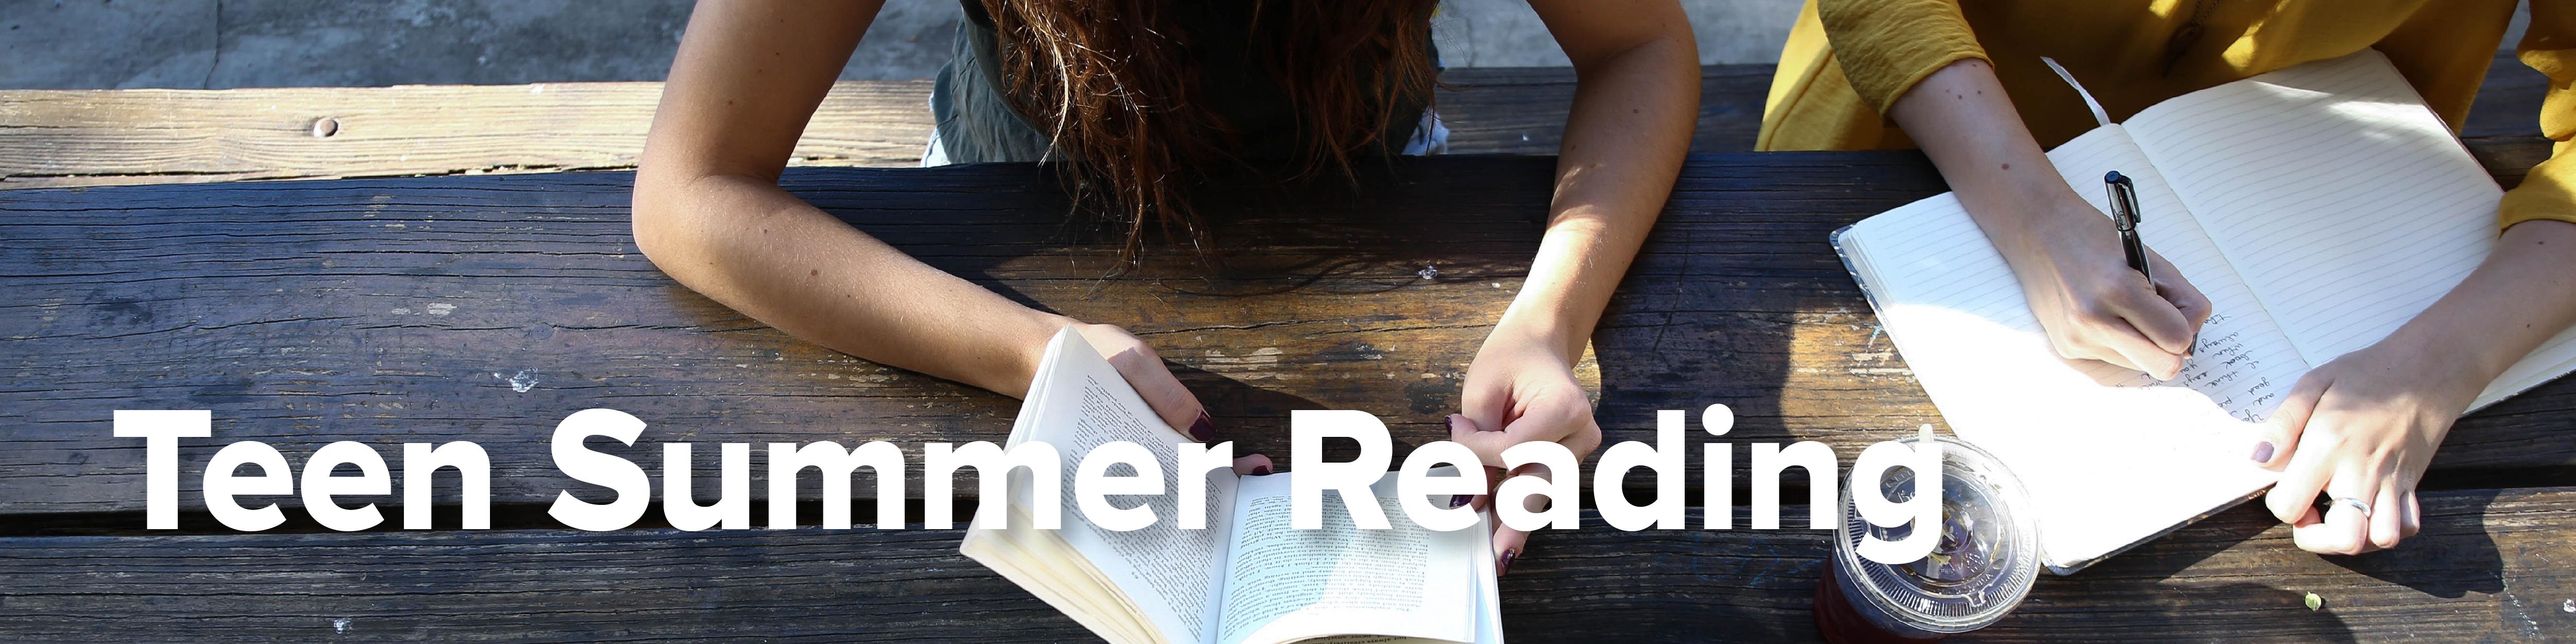 Teen Summer Reading